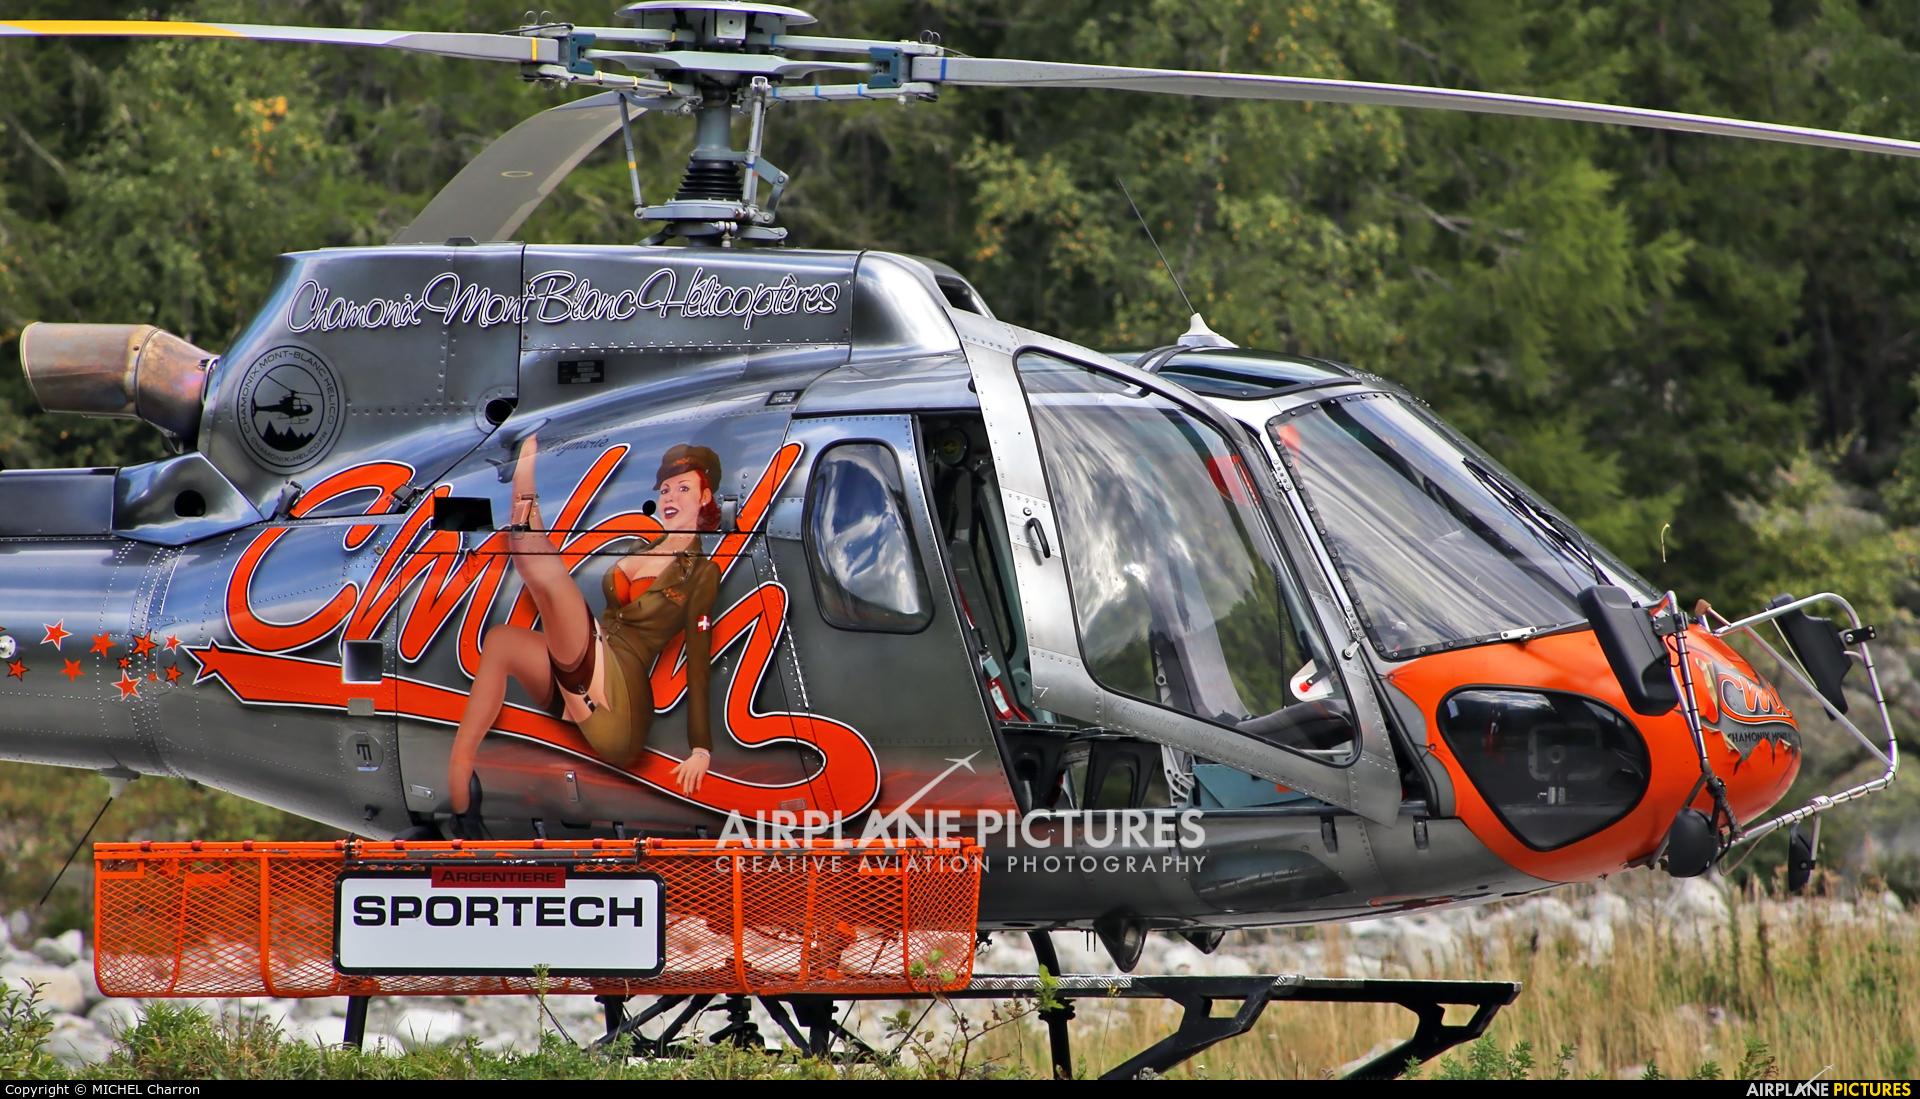 Chamonix-Mont-Blanc Hélicoptères F-HESB aircraft at Argentière